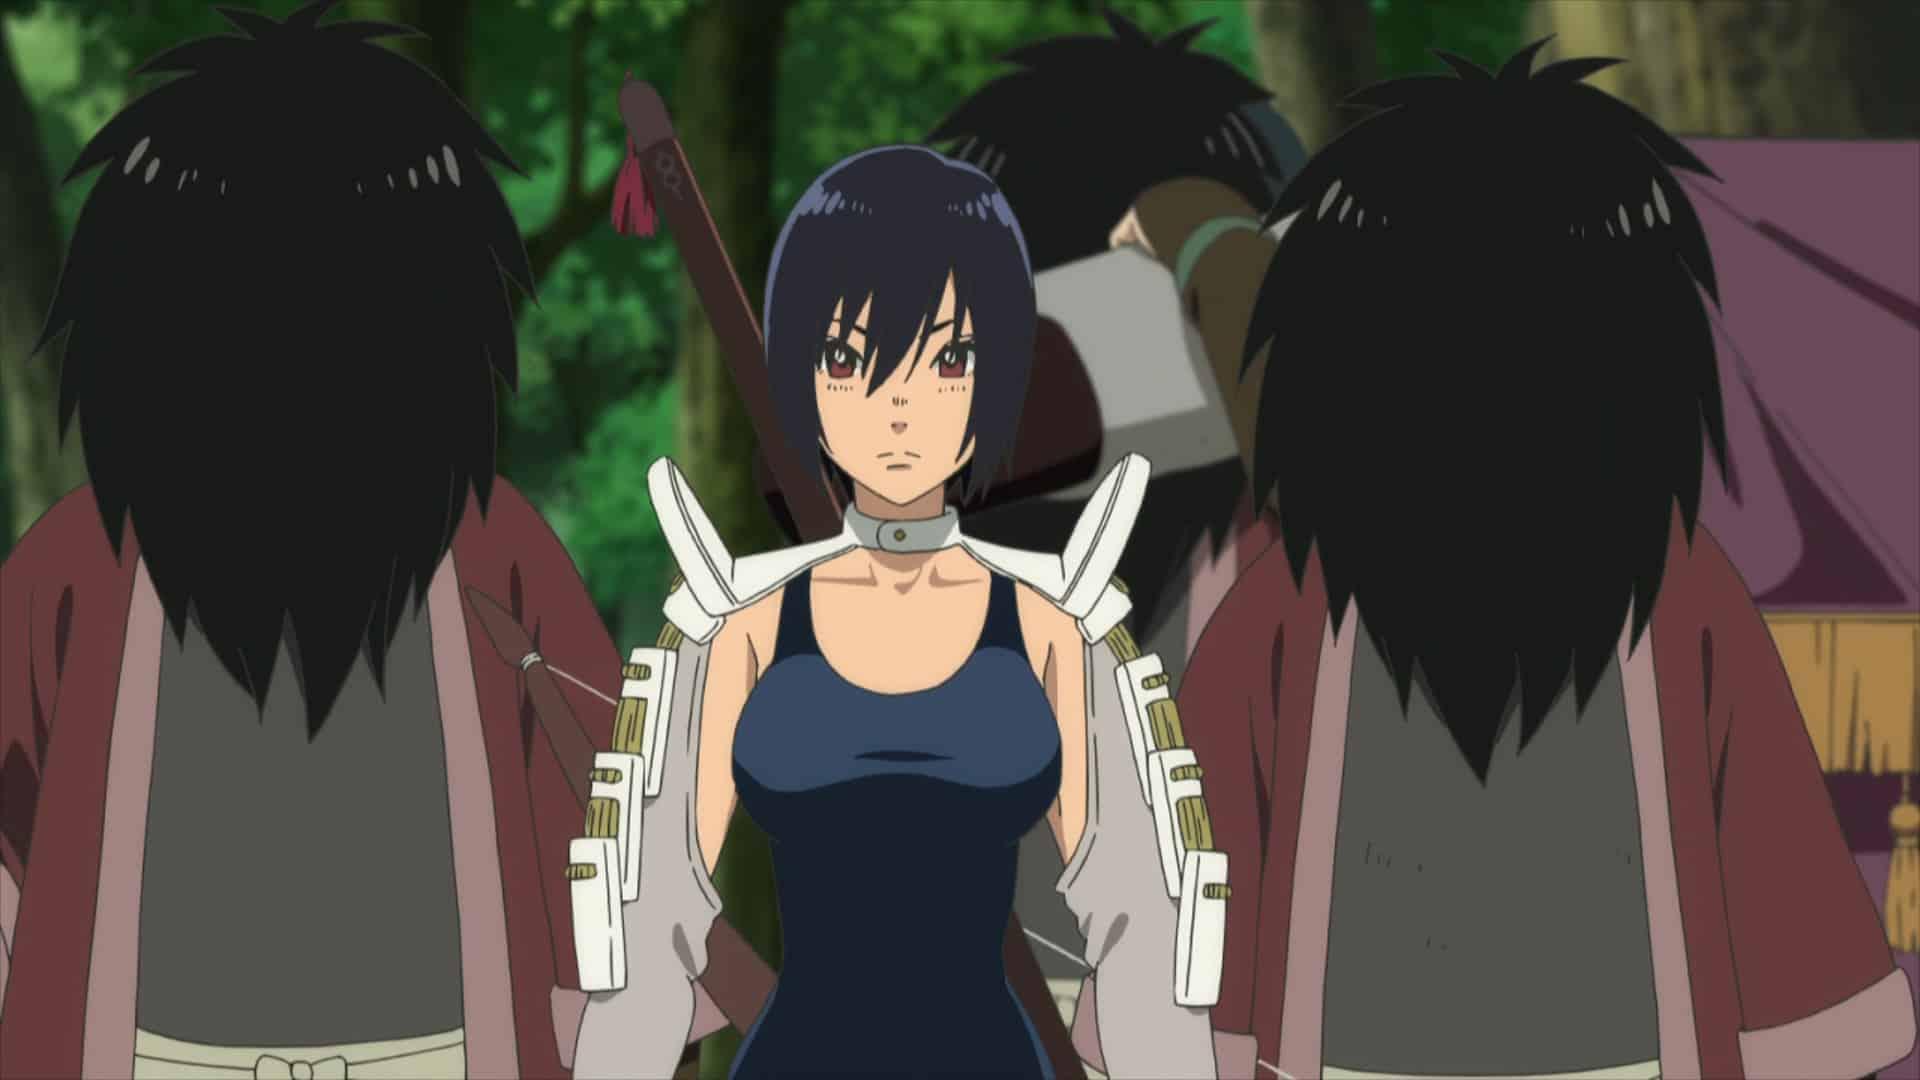 Hayase (Mitsuki Saiga) arriving into the village